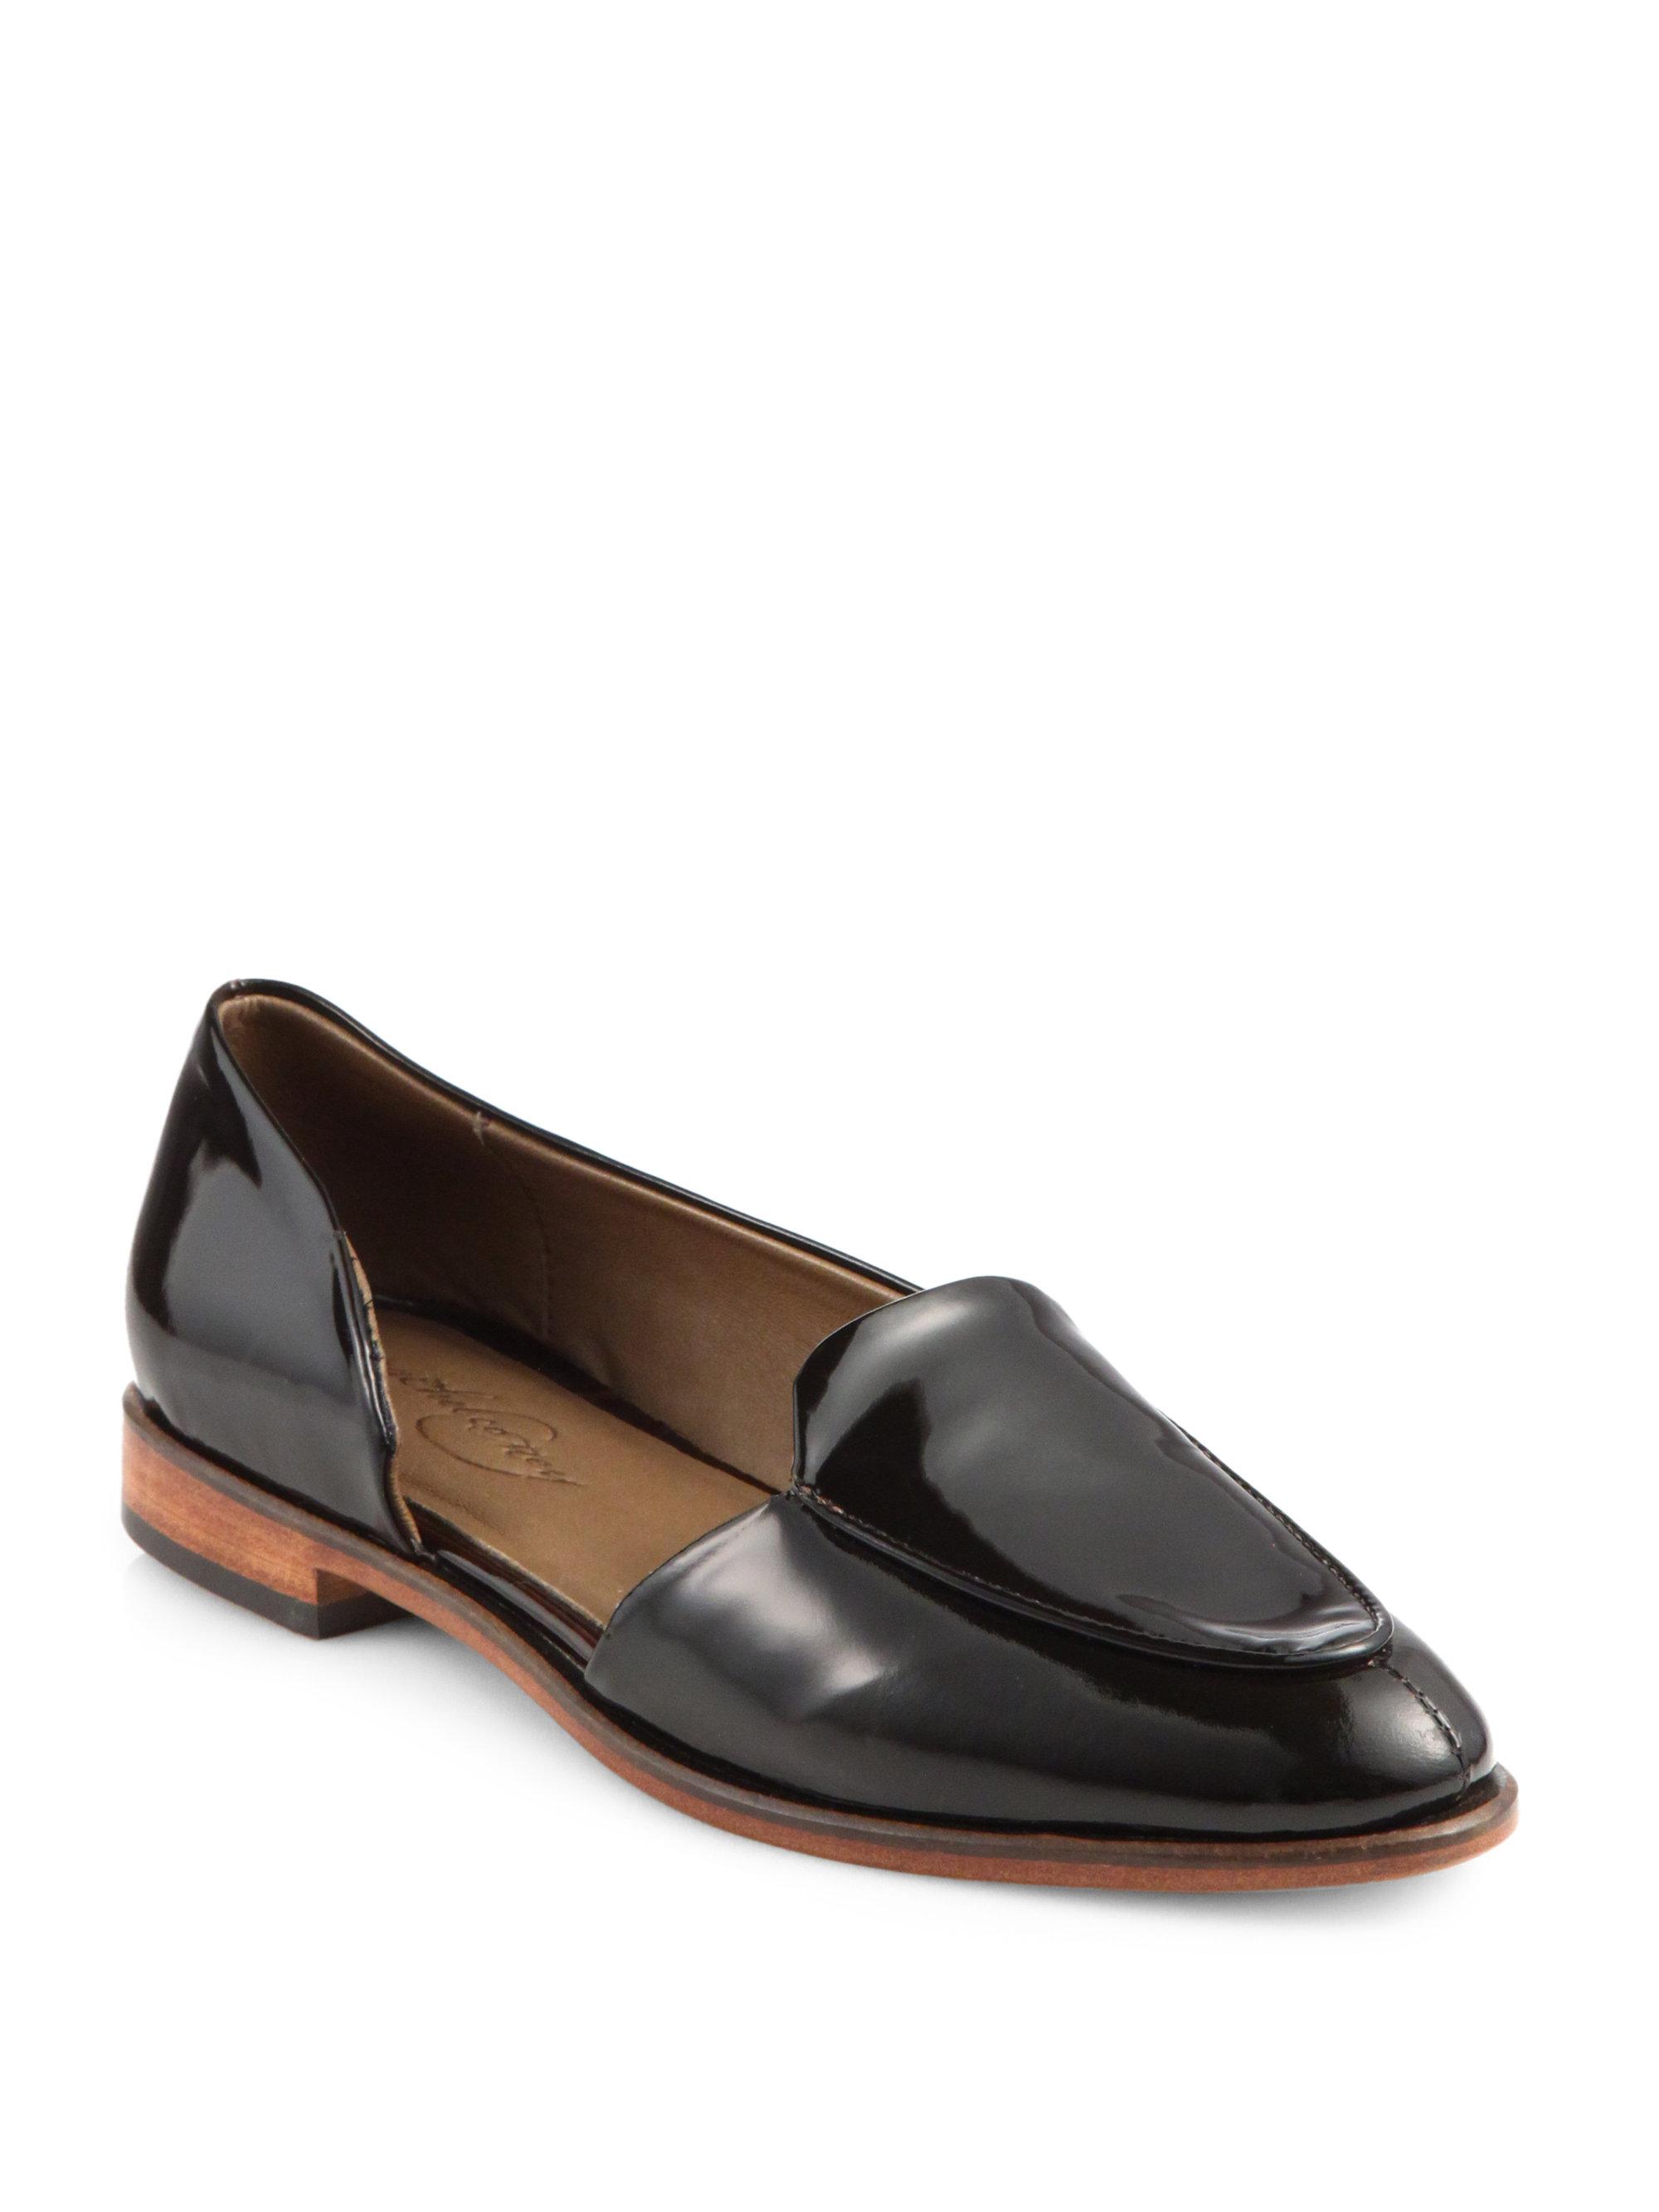 Patent Almond Toe Shoes